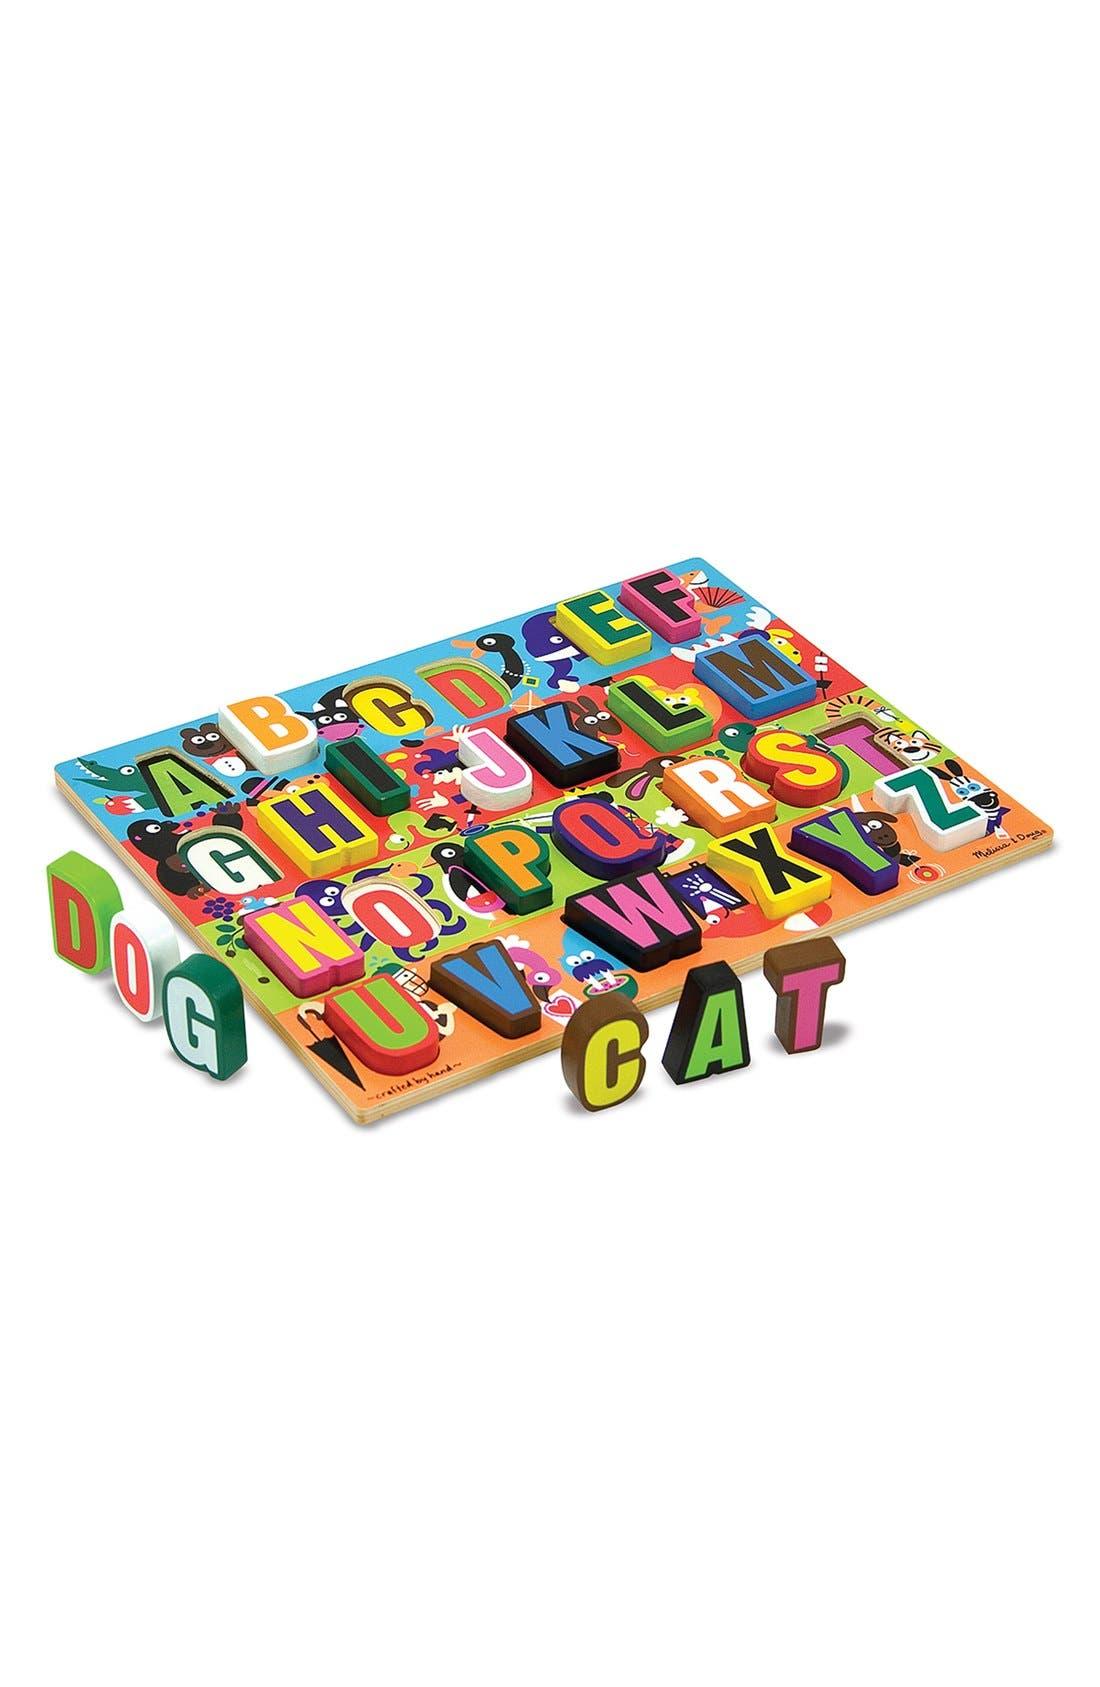 'Jumbo ABC' Chunky Puzzle,                             Main thumbnail 1, color,                             RED MULTI